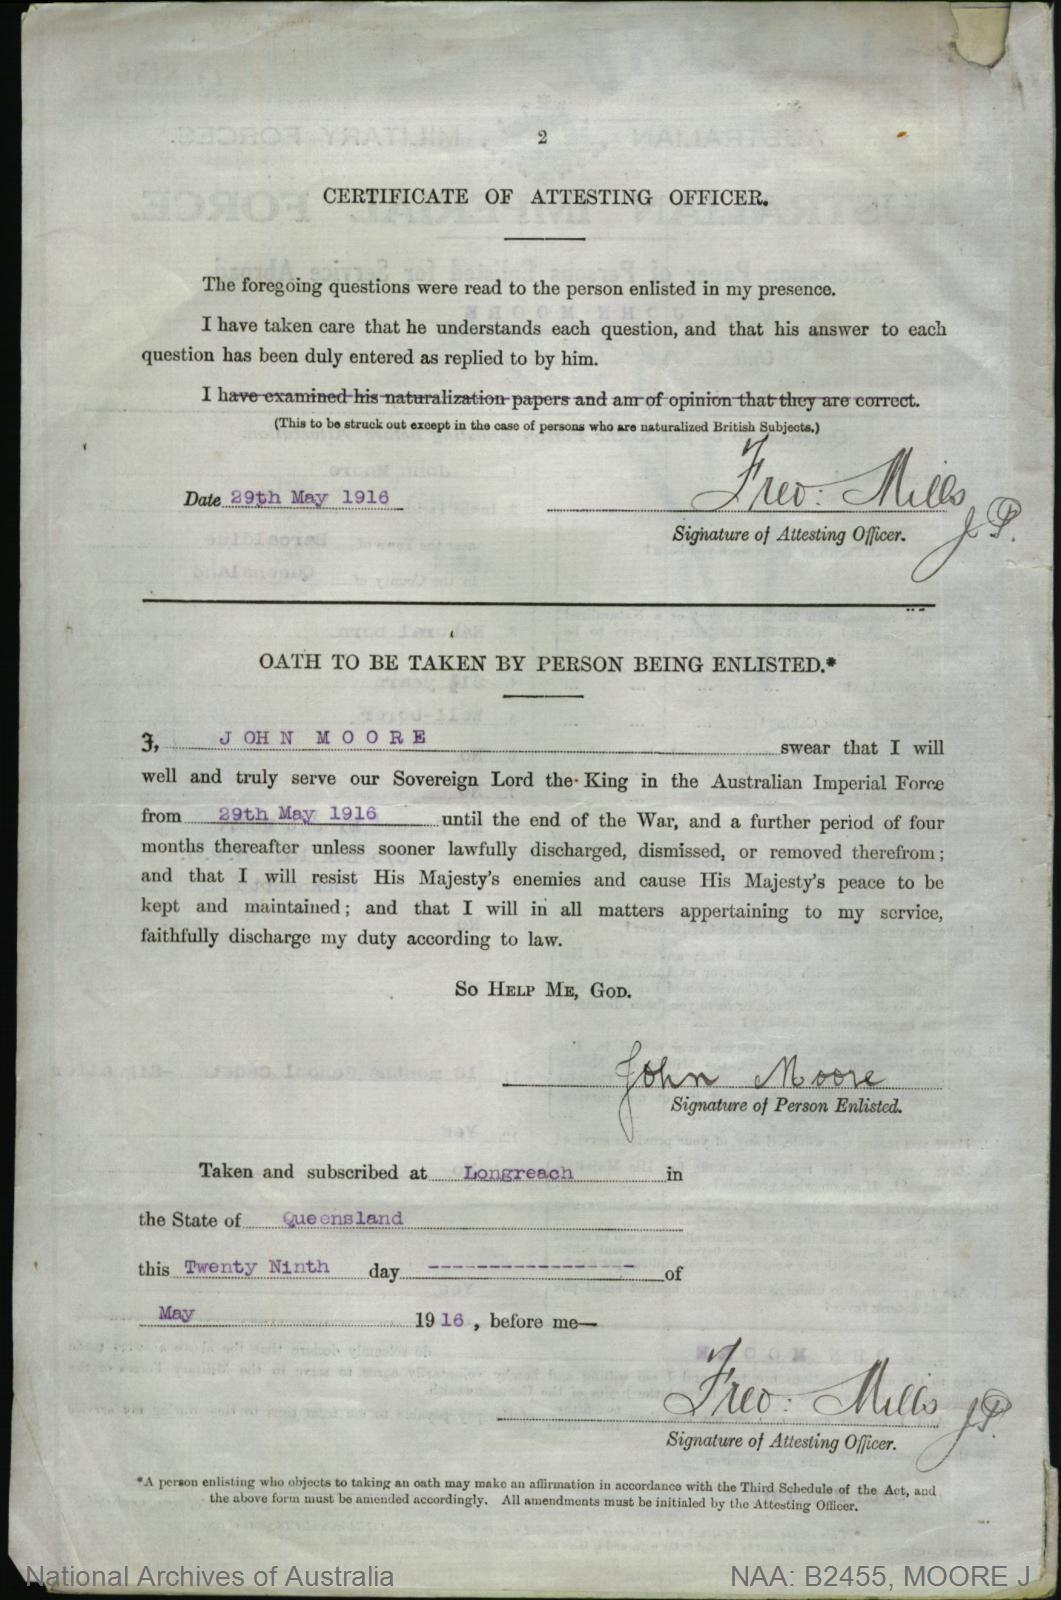 Moore John : SERN 3012 : POB Barcaldine QLD : POE Longreach QLD : NOK F Moore Samuel Ernest